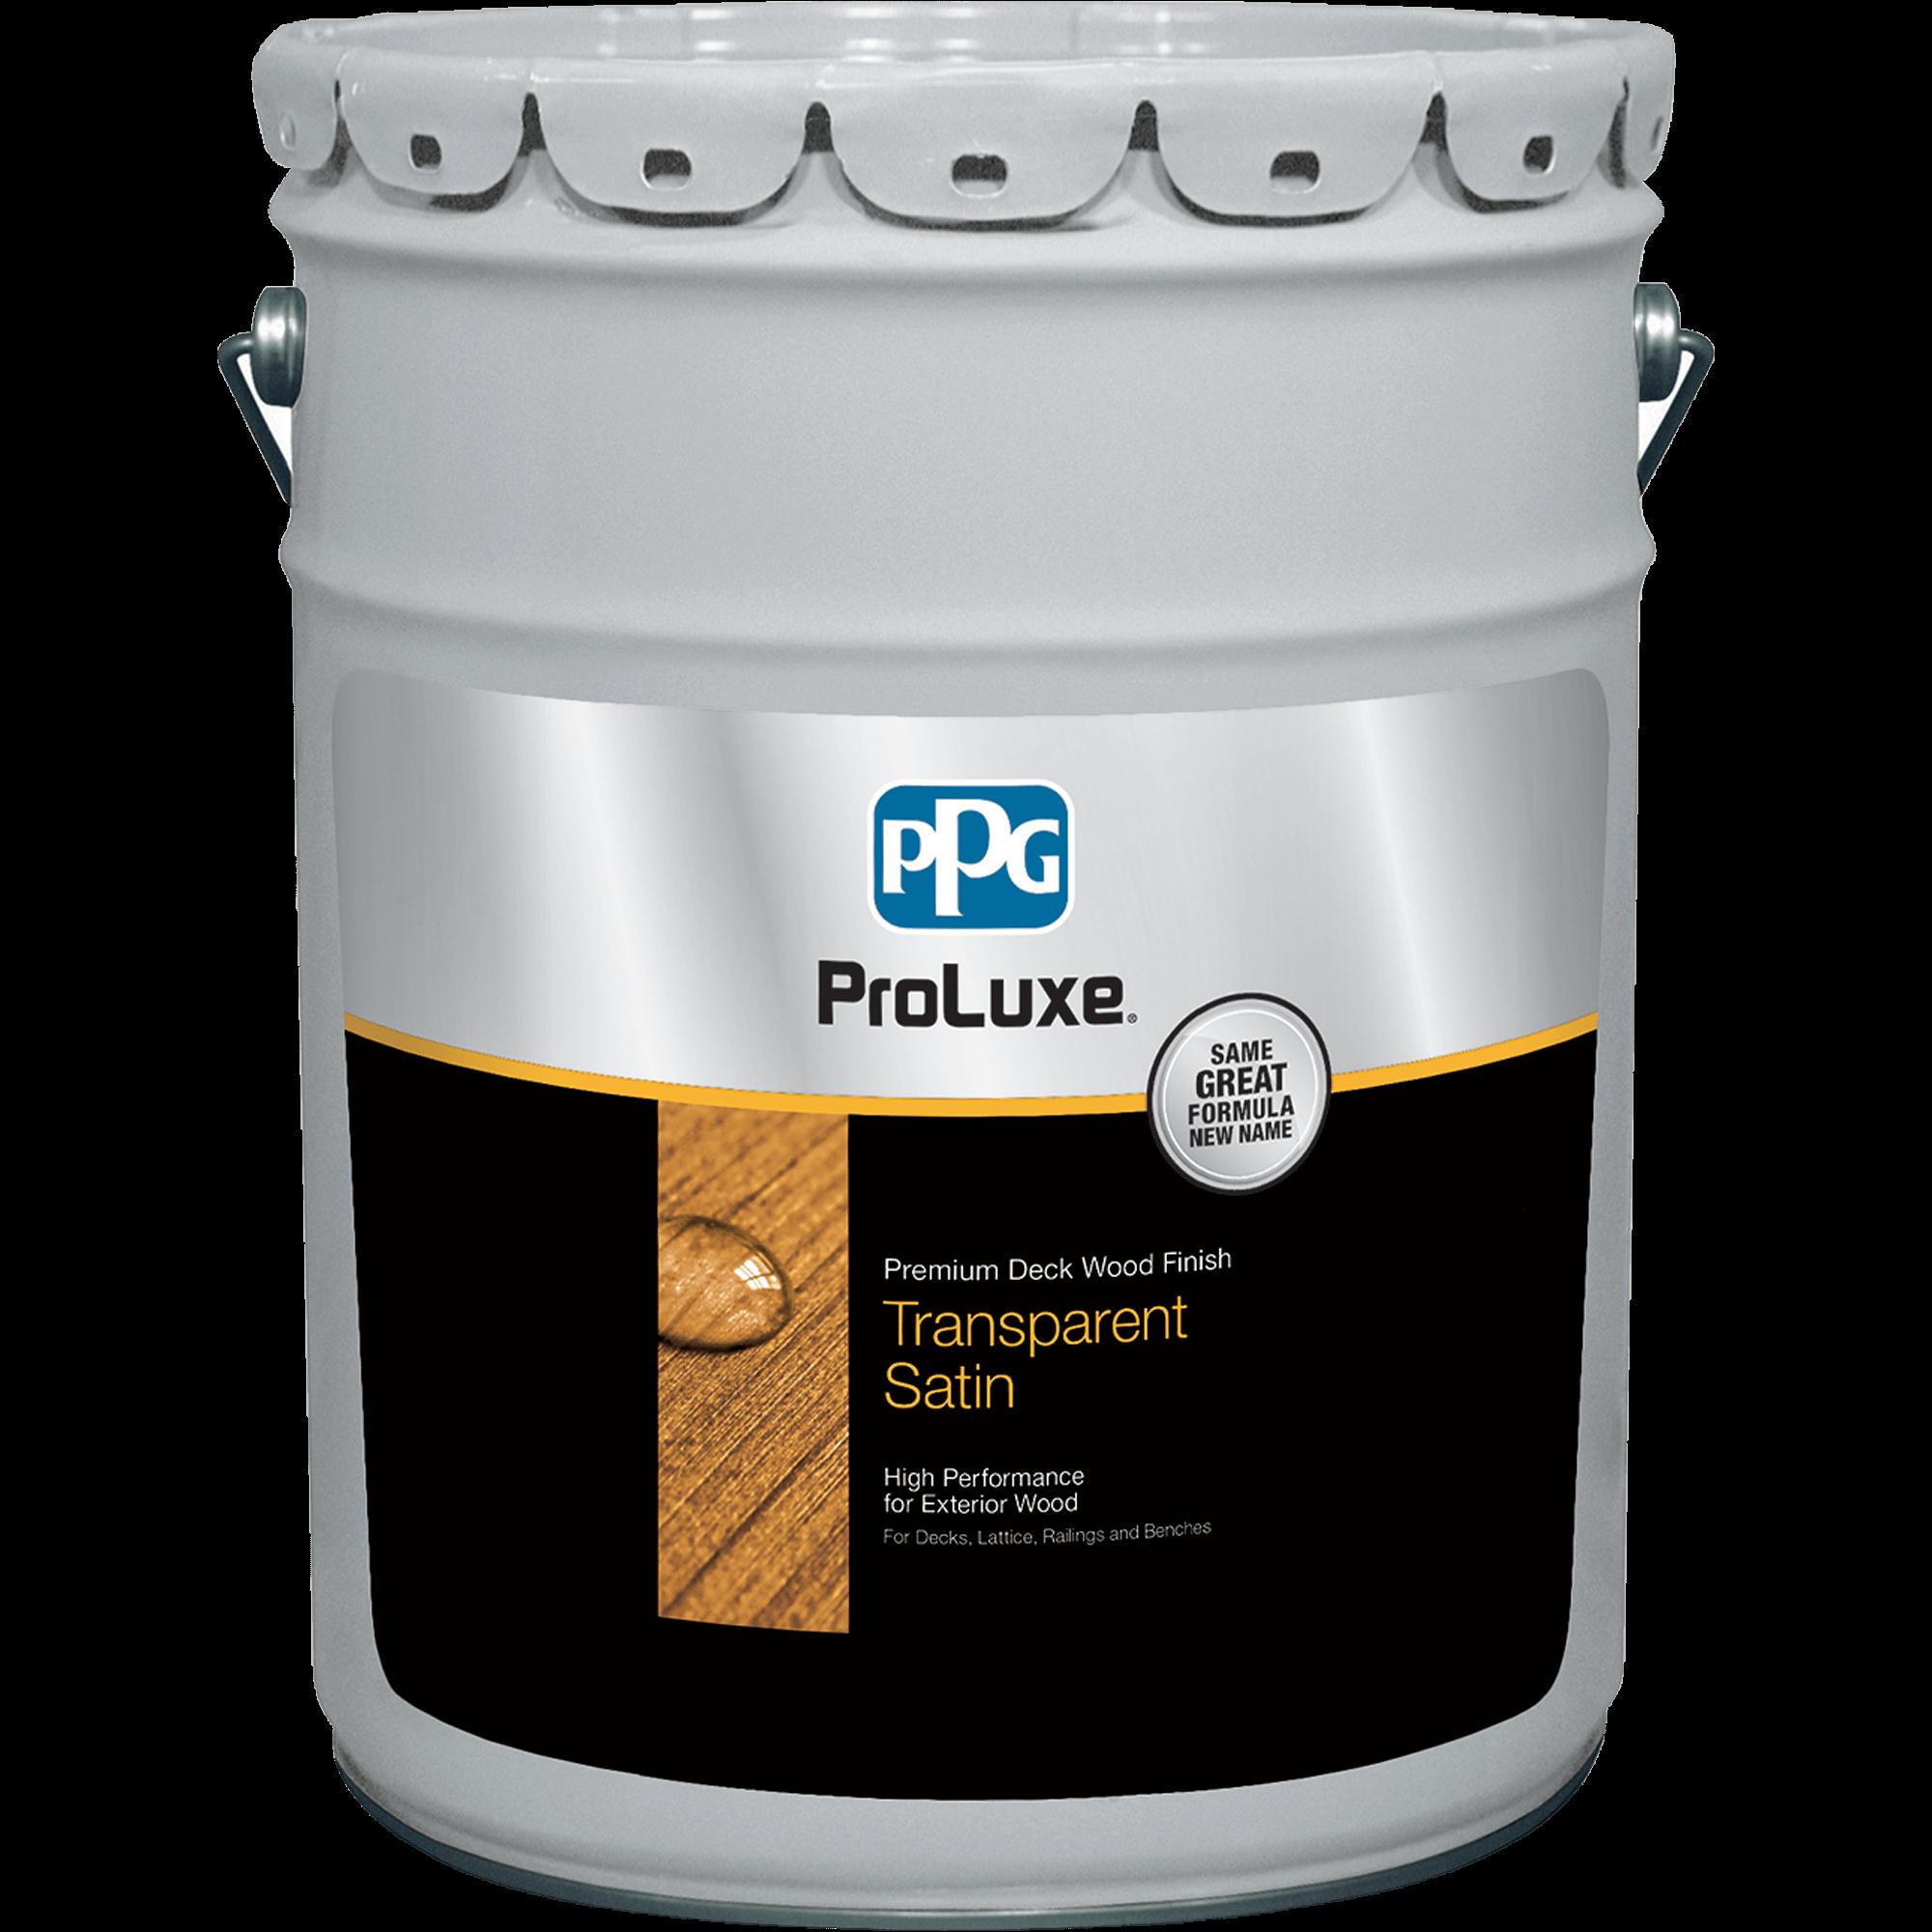 PROLUXE<sup>®</sup> Premium Deck Wood Finish 5 Gallon